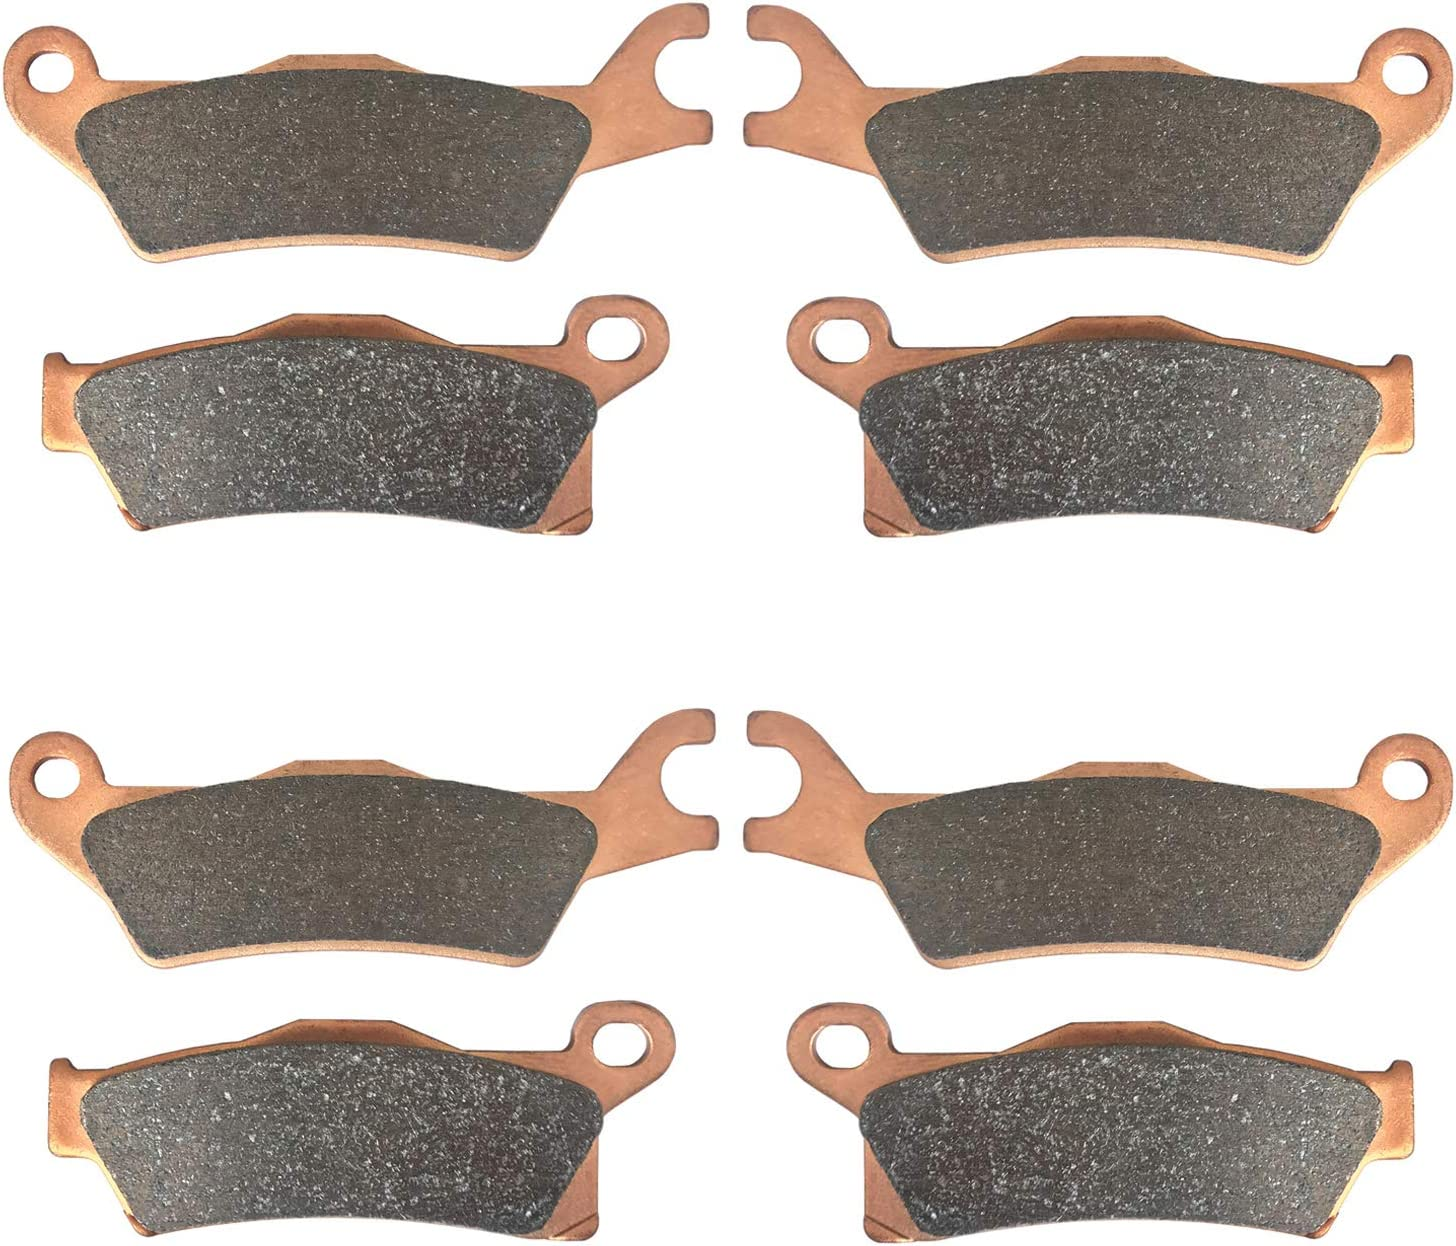 Zinger FrontRear Brake Pads for Can-Am Sacramento Mall Nashville-Davidson Mall 570 Renegade XMR 500 STD